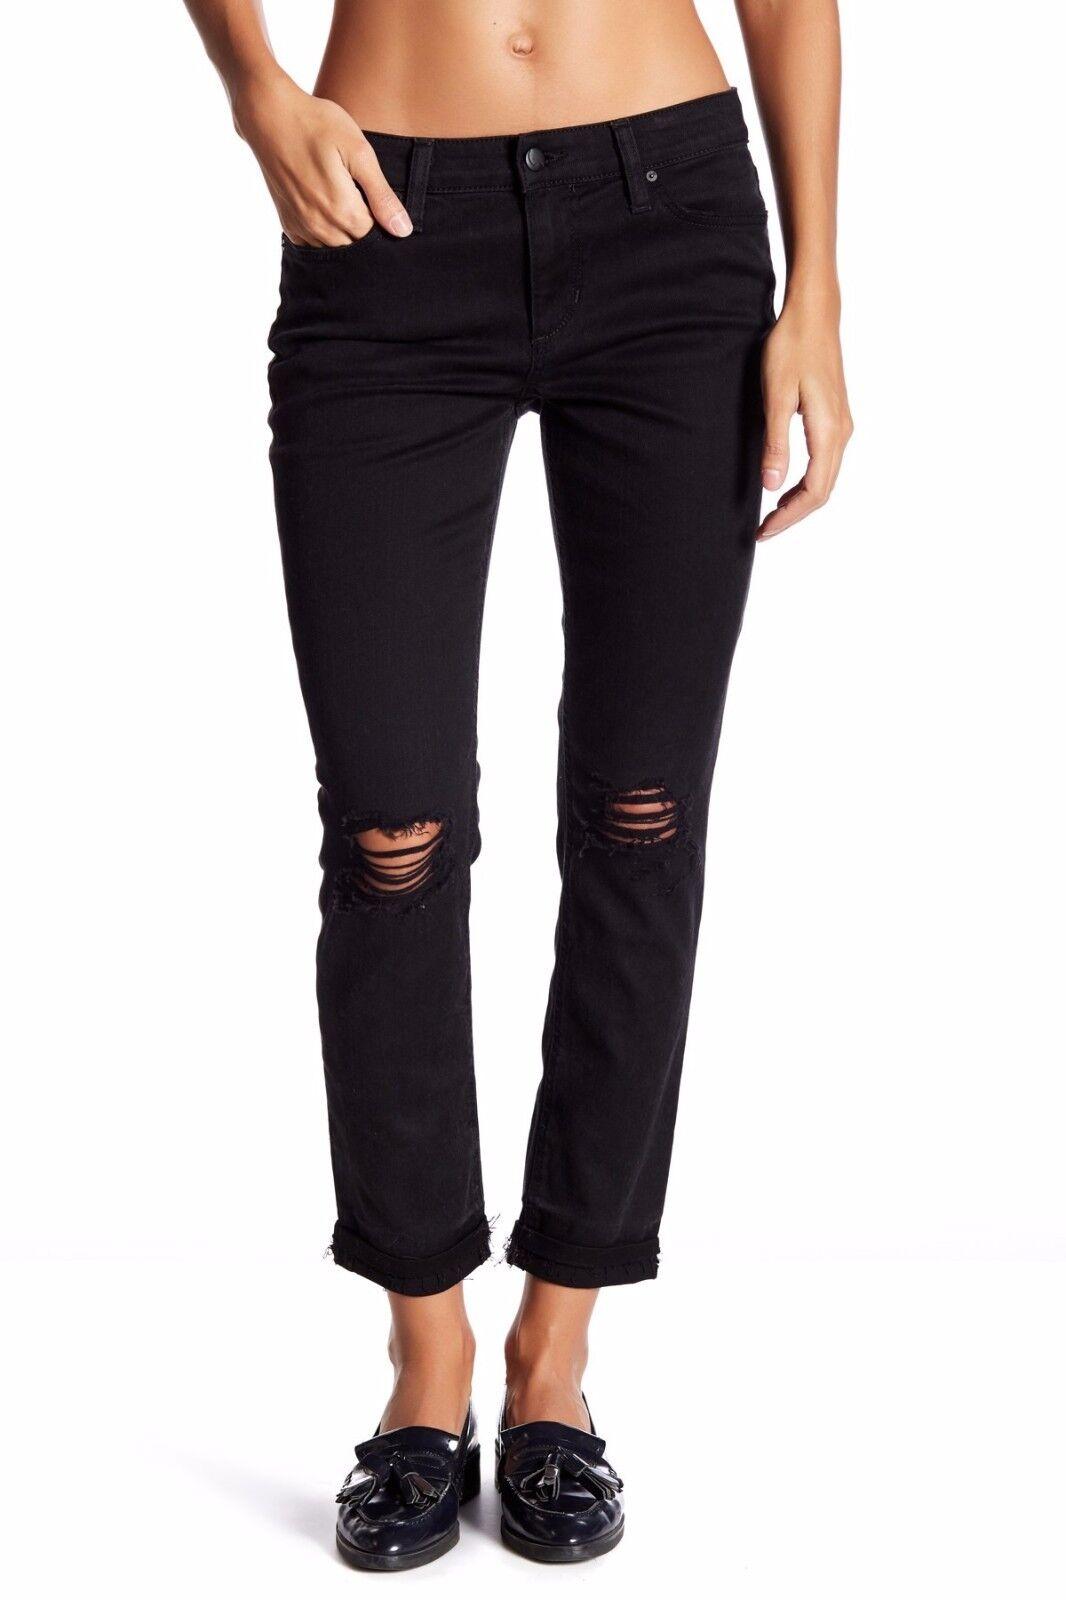 Joe's Jeans The Markie Skinny Ankle Crop Pants Vyola 28 29 Nwt  179